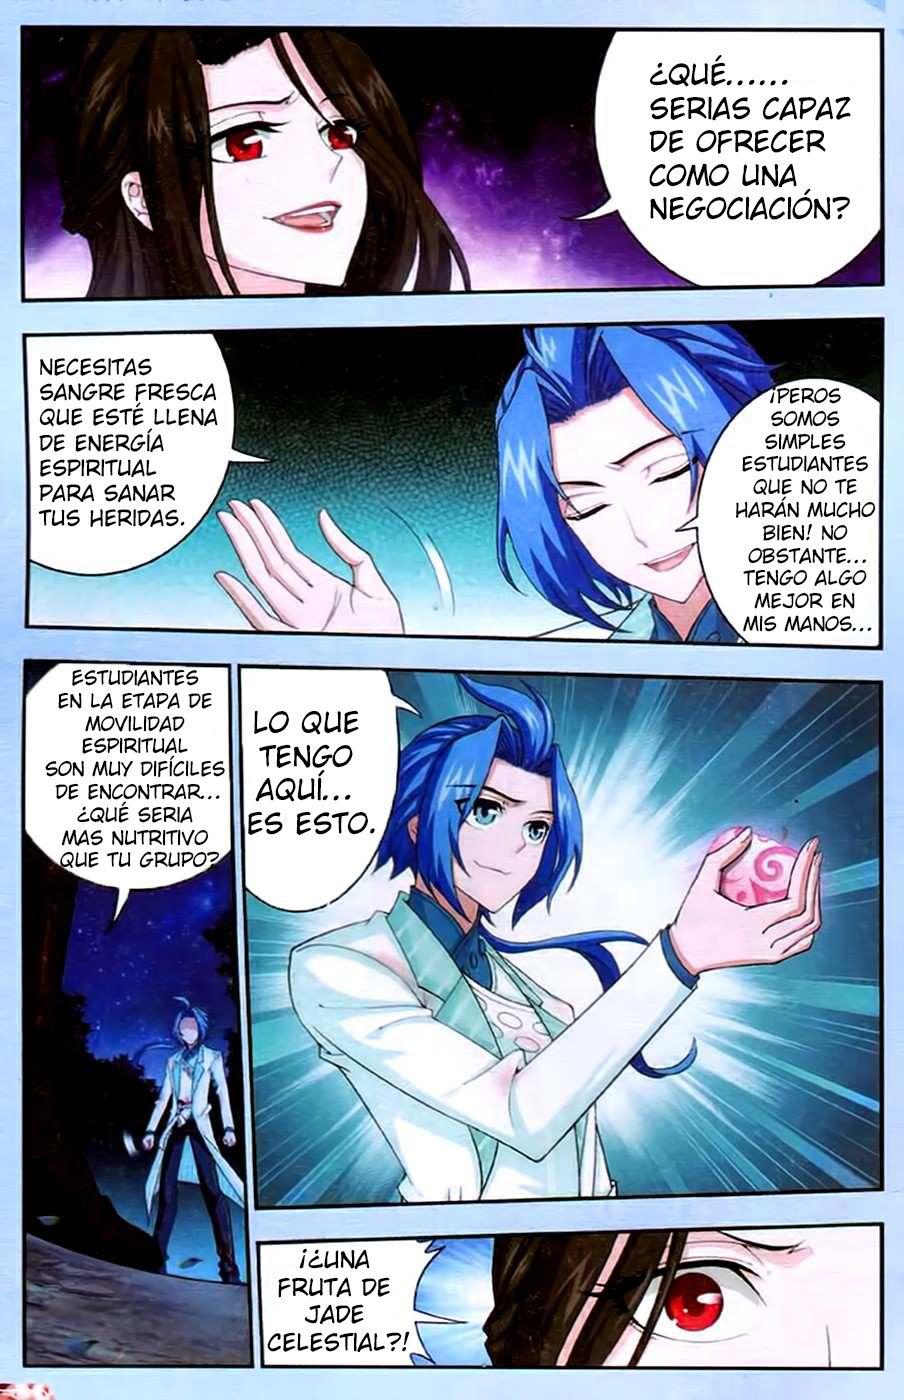 http://c5.ninemanga.com/es_manga/26/16346/457755/9398a81b705d554c0e94ef6b2081ffd4.jpg Page 5